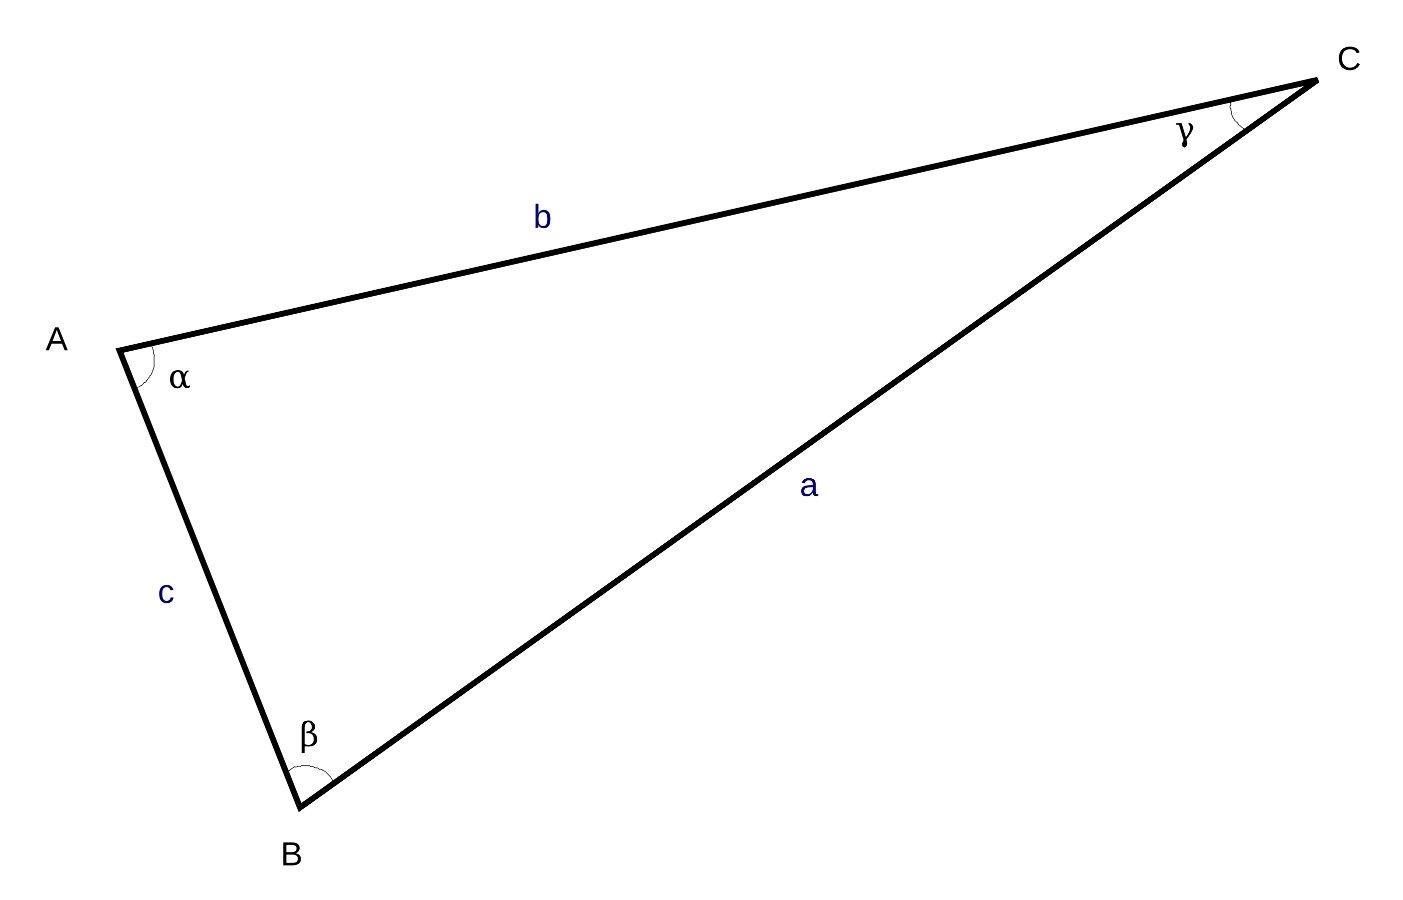 Principe de la triangulation, loi des sinus